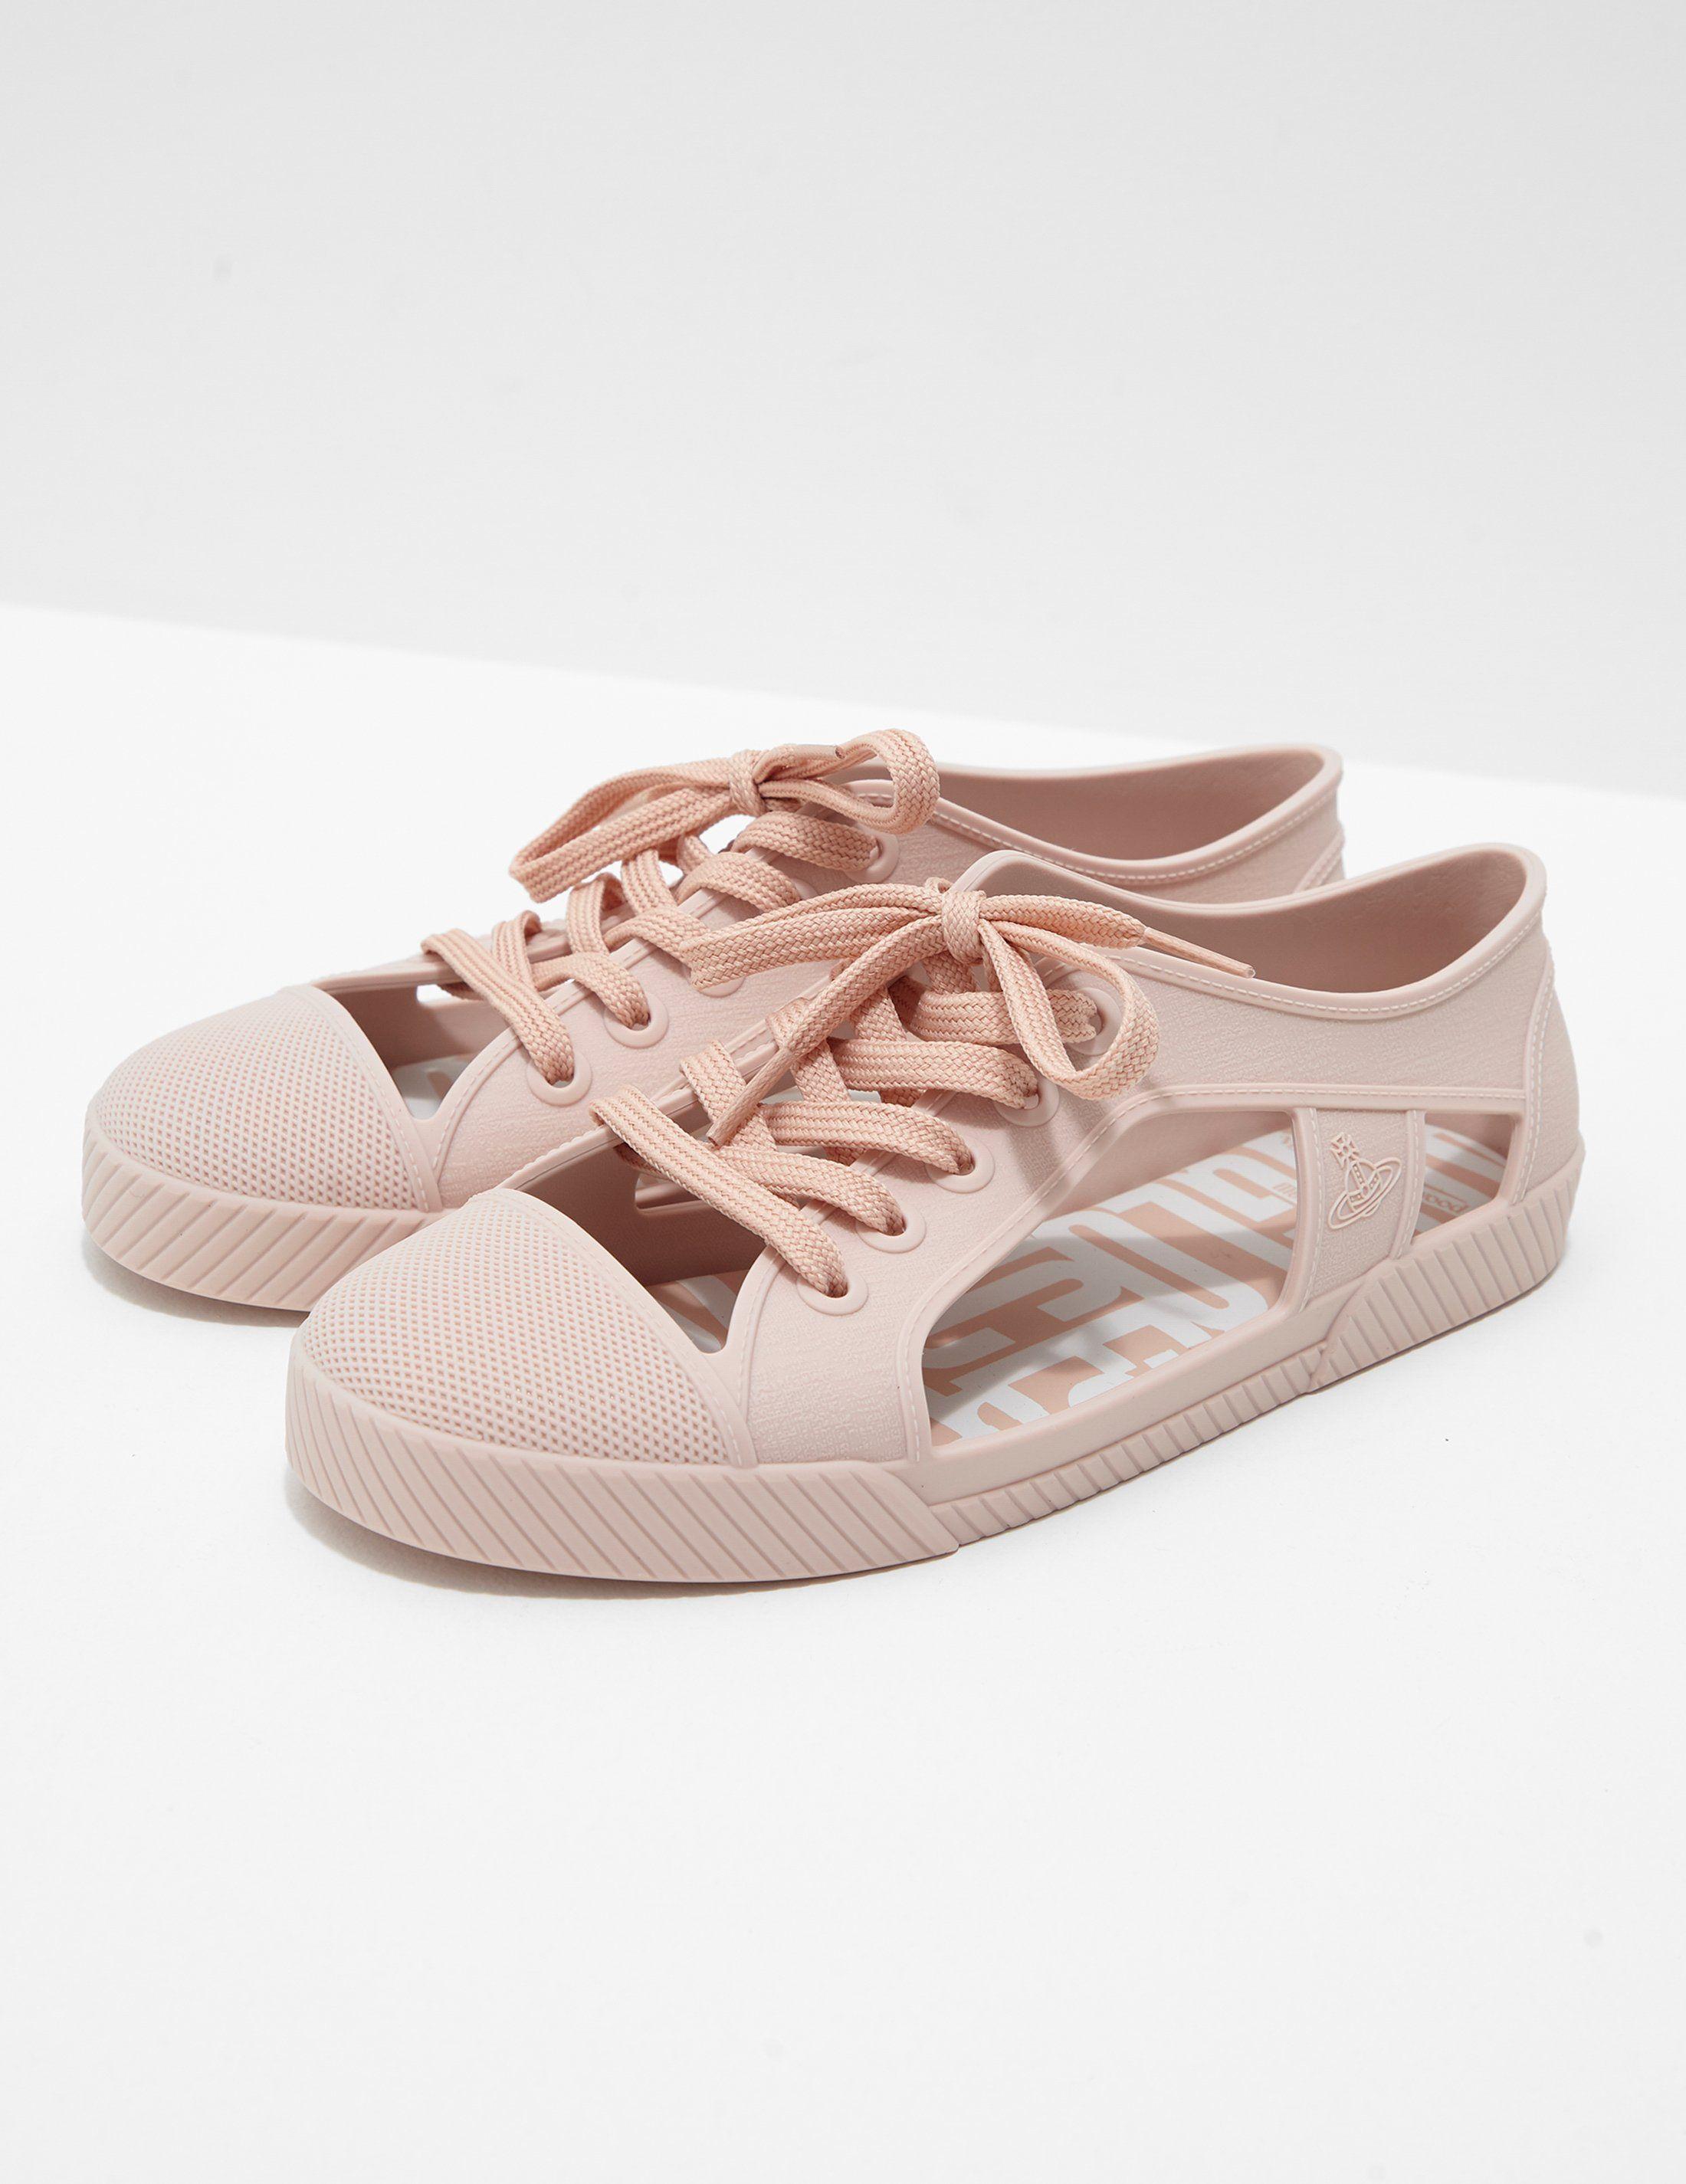 Melissa x Vivienne Westwood Brighton Sneaker